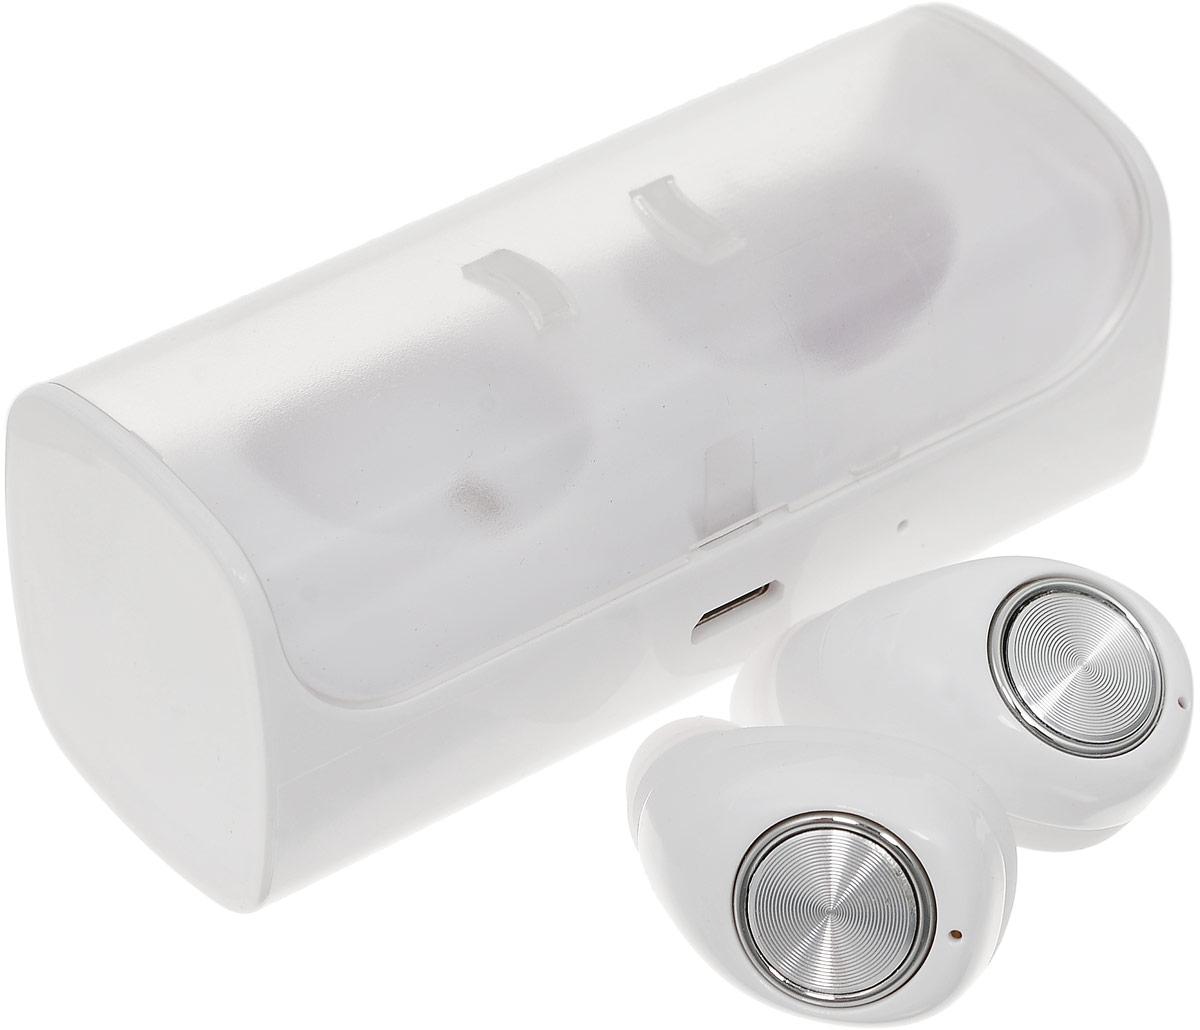 Mettle TWS-10, White Silver беспроводные наушники